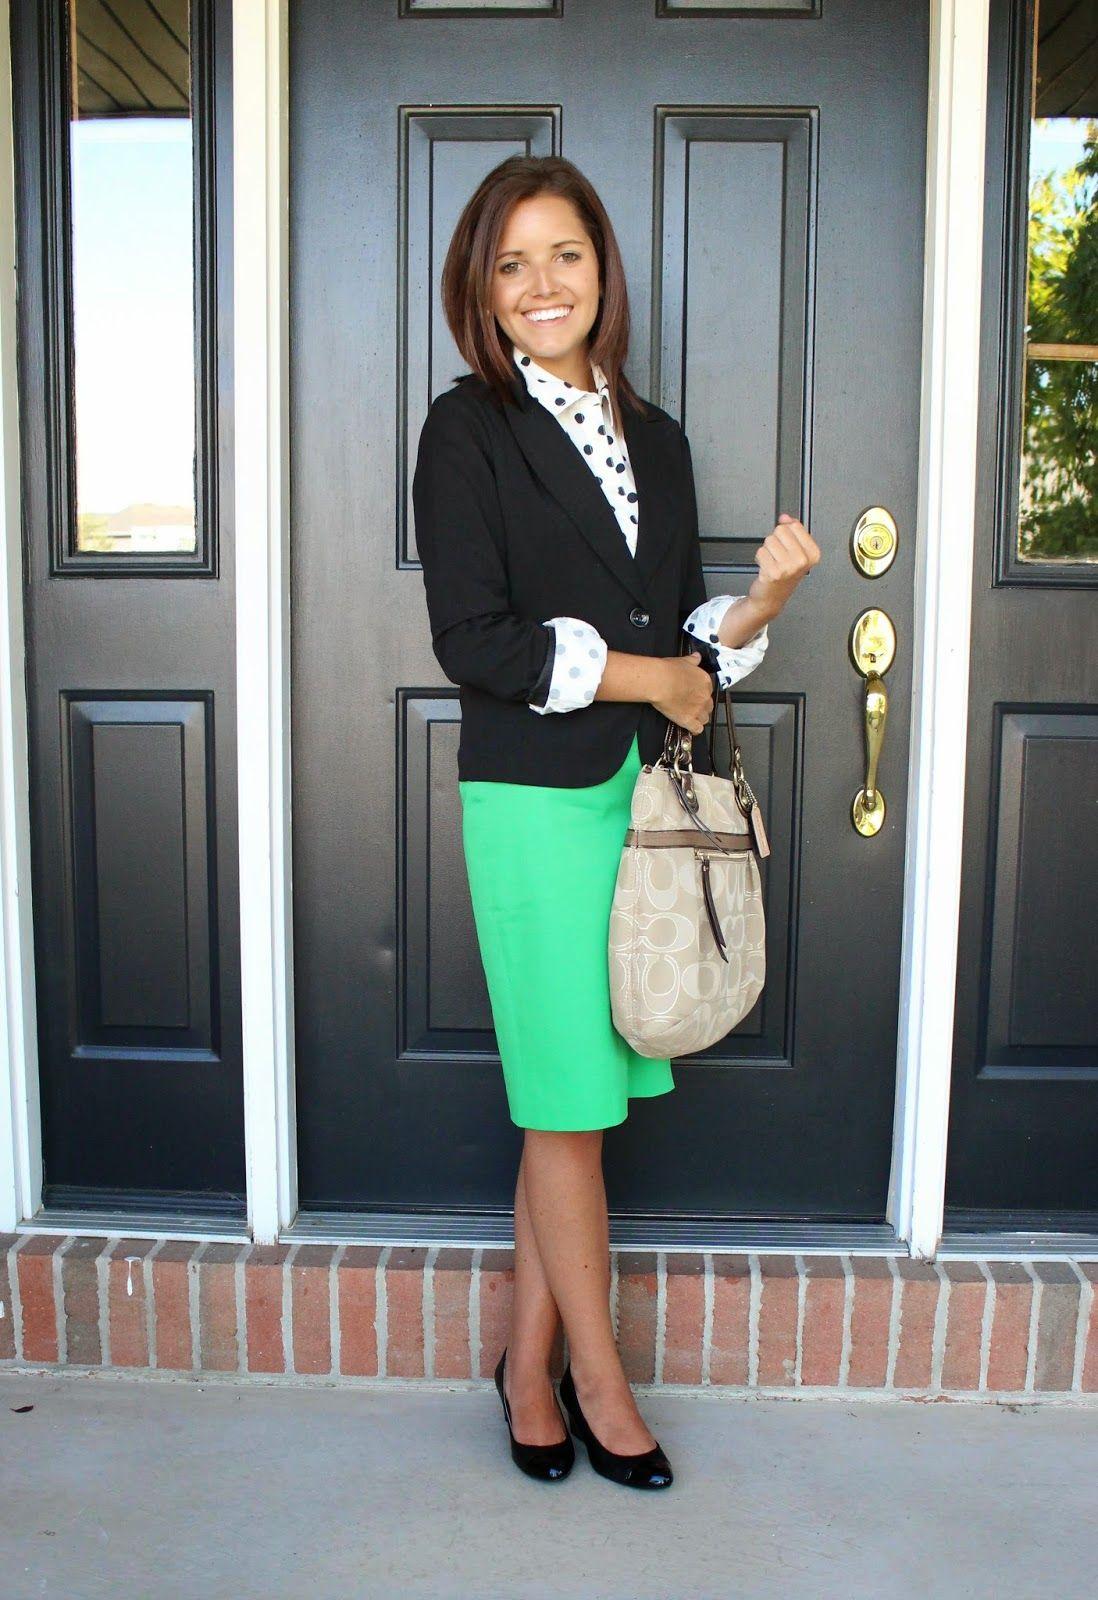 how to dress for a teacher interview